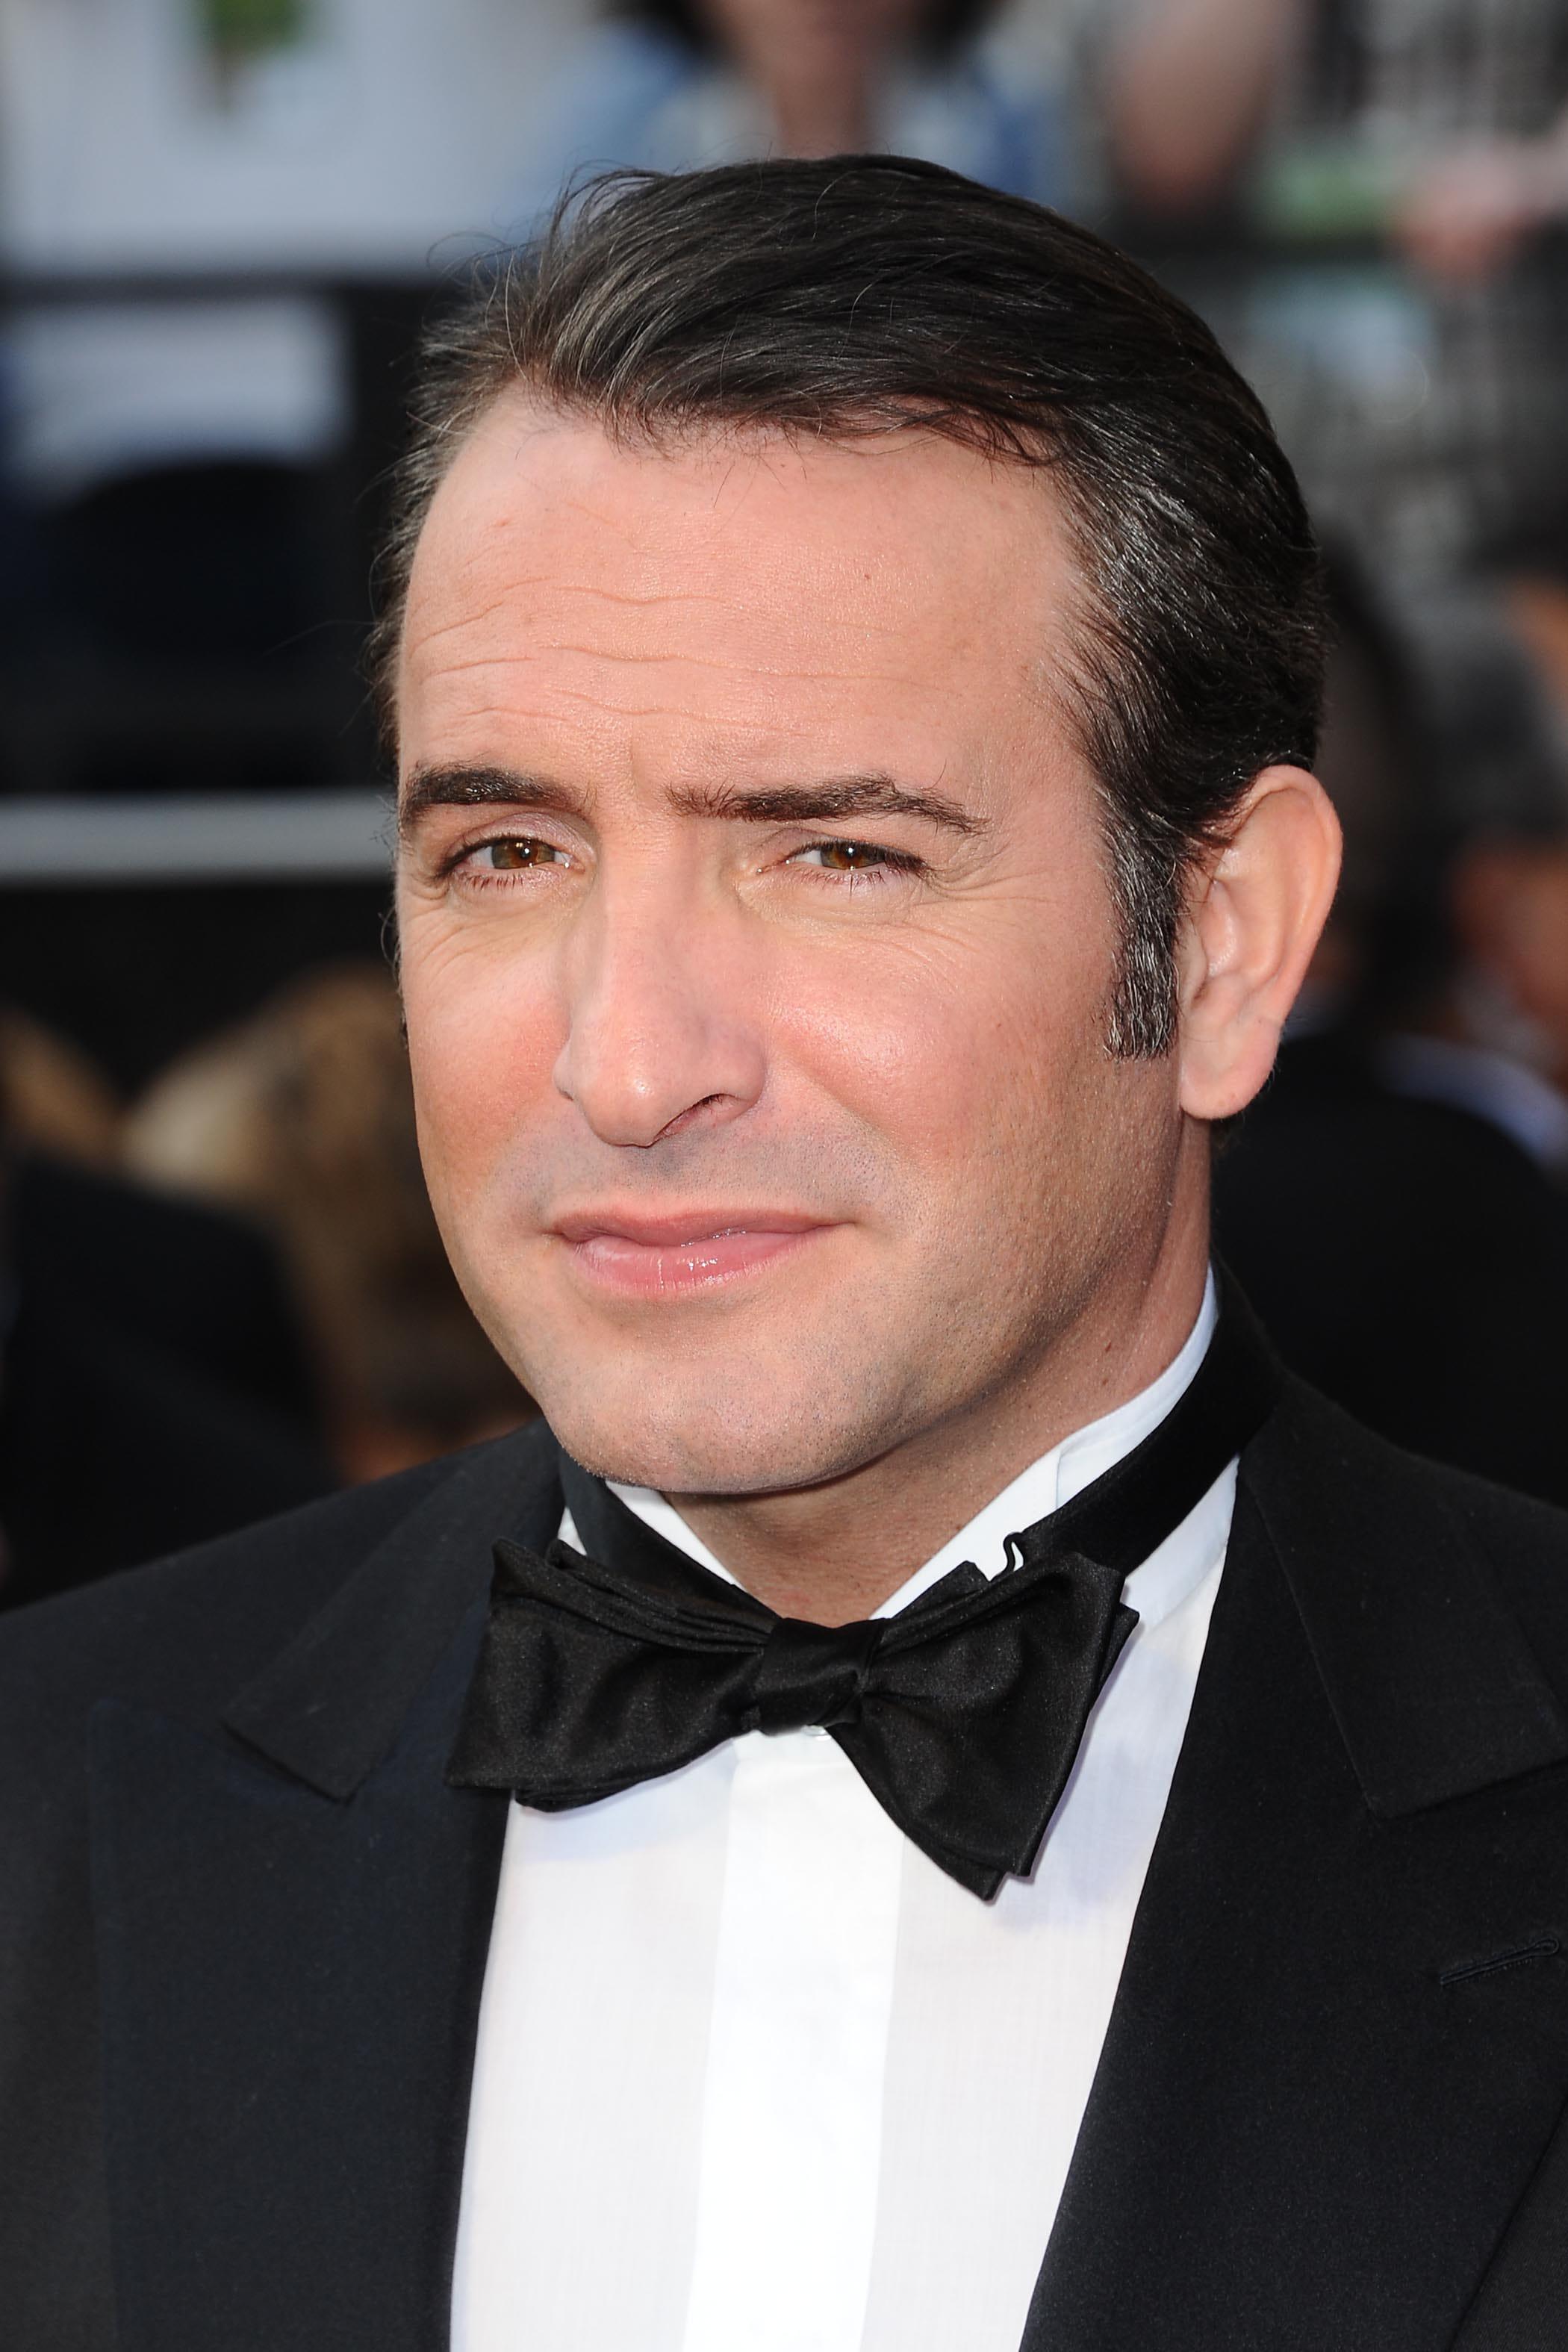 Jean dujardin sans barbe avant apr s les stars for Entreprise dujardin